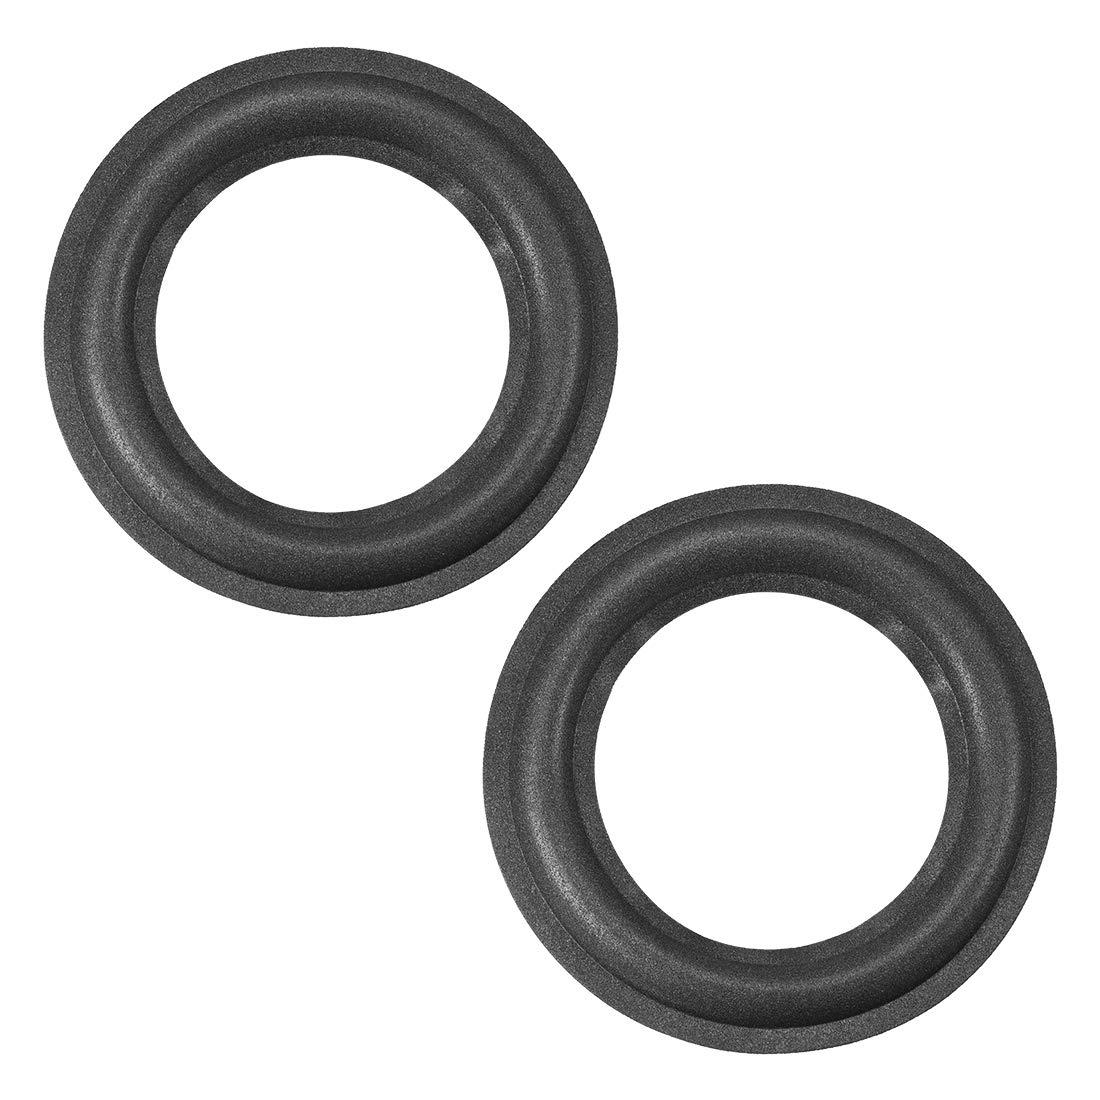 uxcell 4.5 4.5 inch Speaker Foam Edge Surround Rings Replacement Parts for Speaker Repair or DIY 2pcs